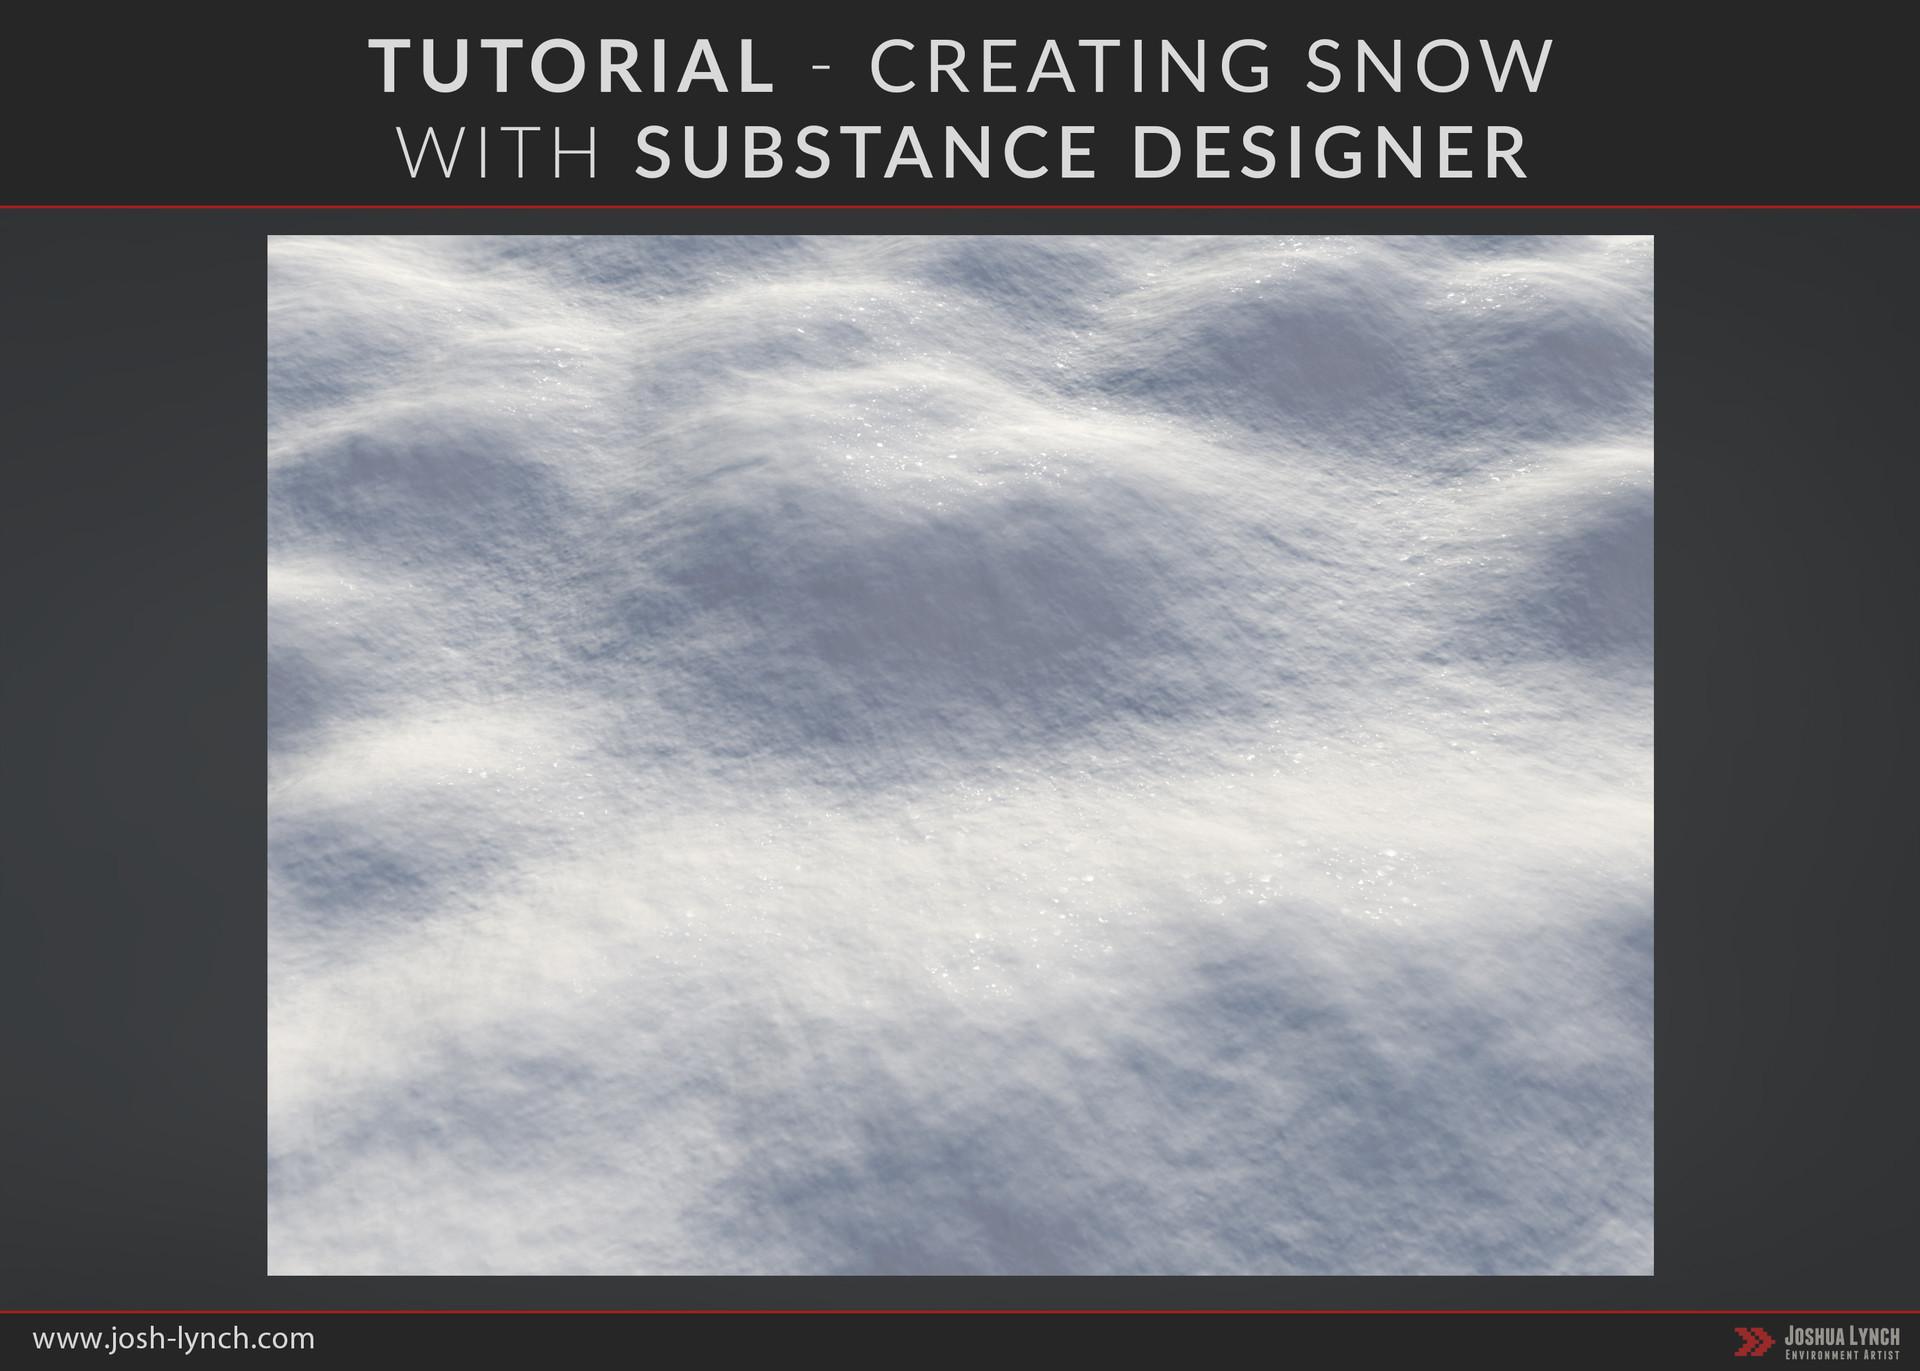 Joshua lynch substance designer snow thumbnail page